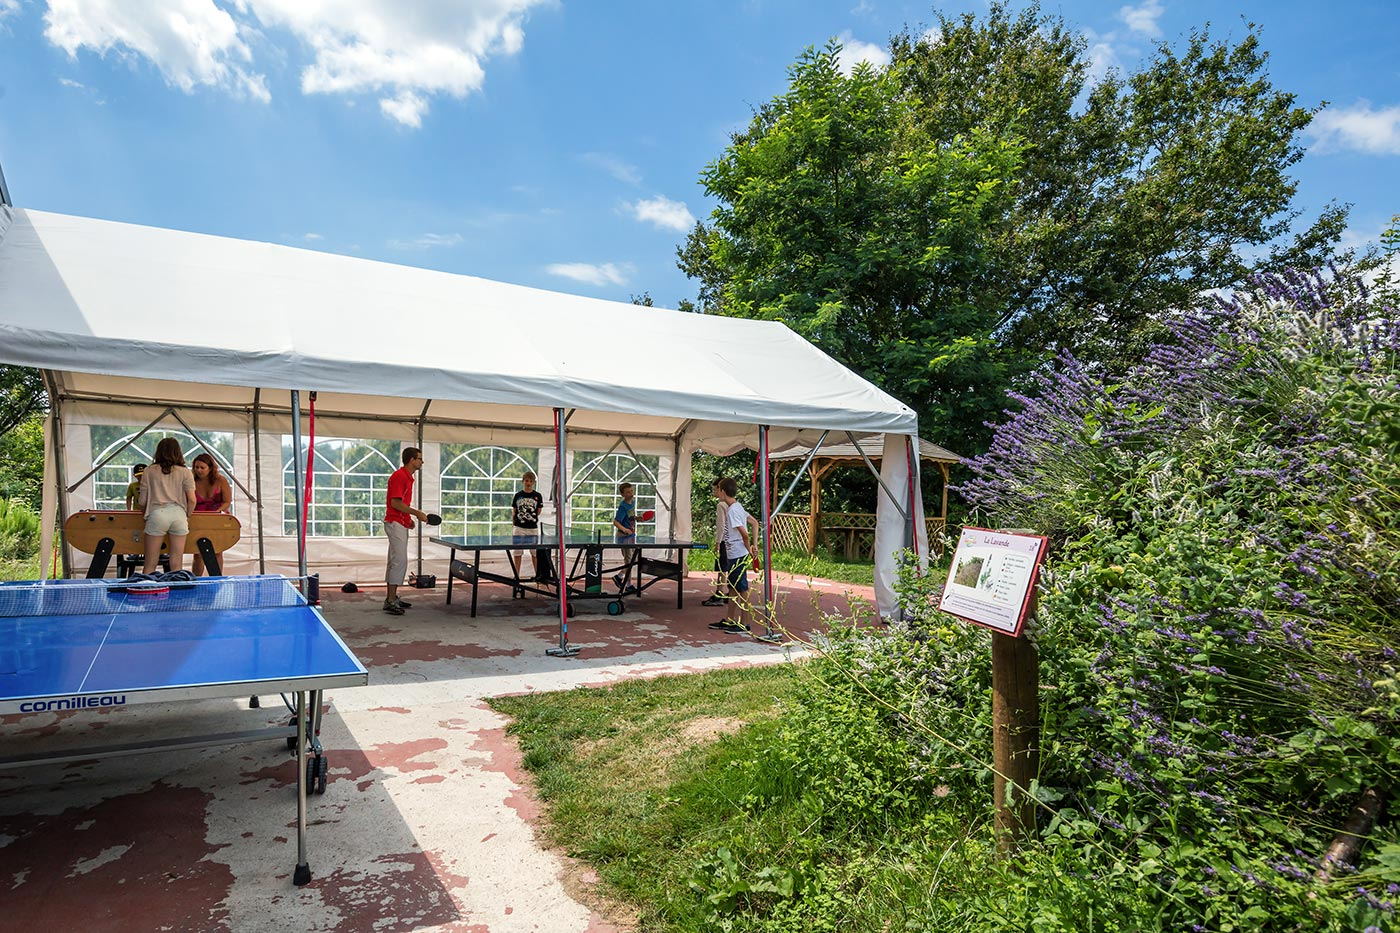 Camping tarn avec piscines et espace aquatique salle sport for Camping tarn et garonne avec piscine